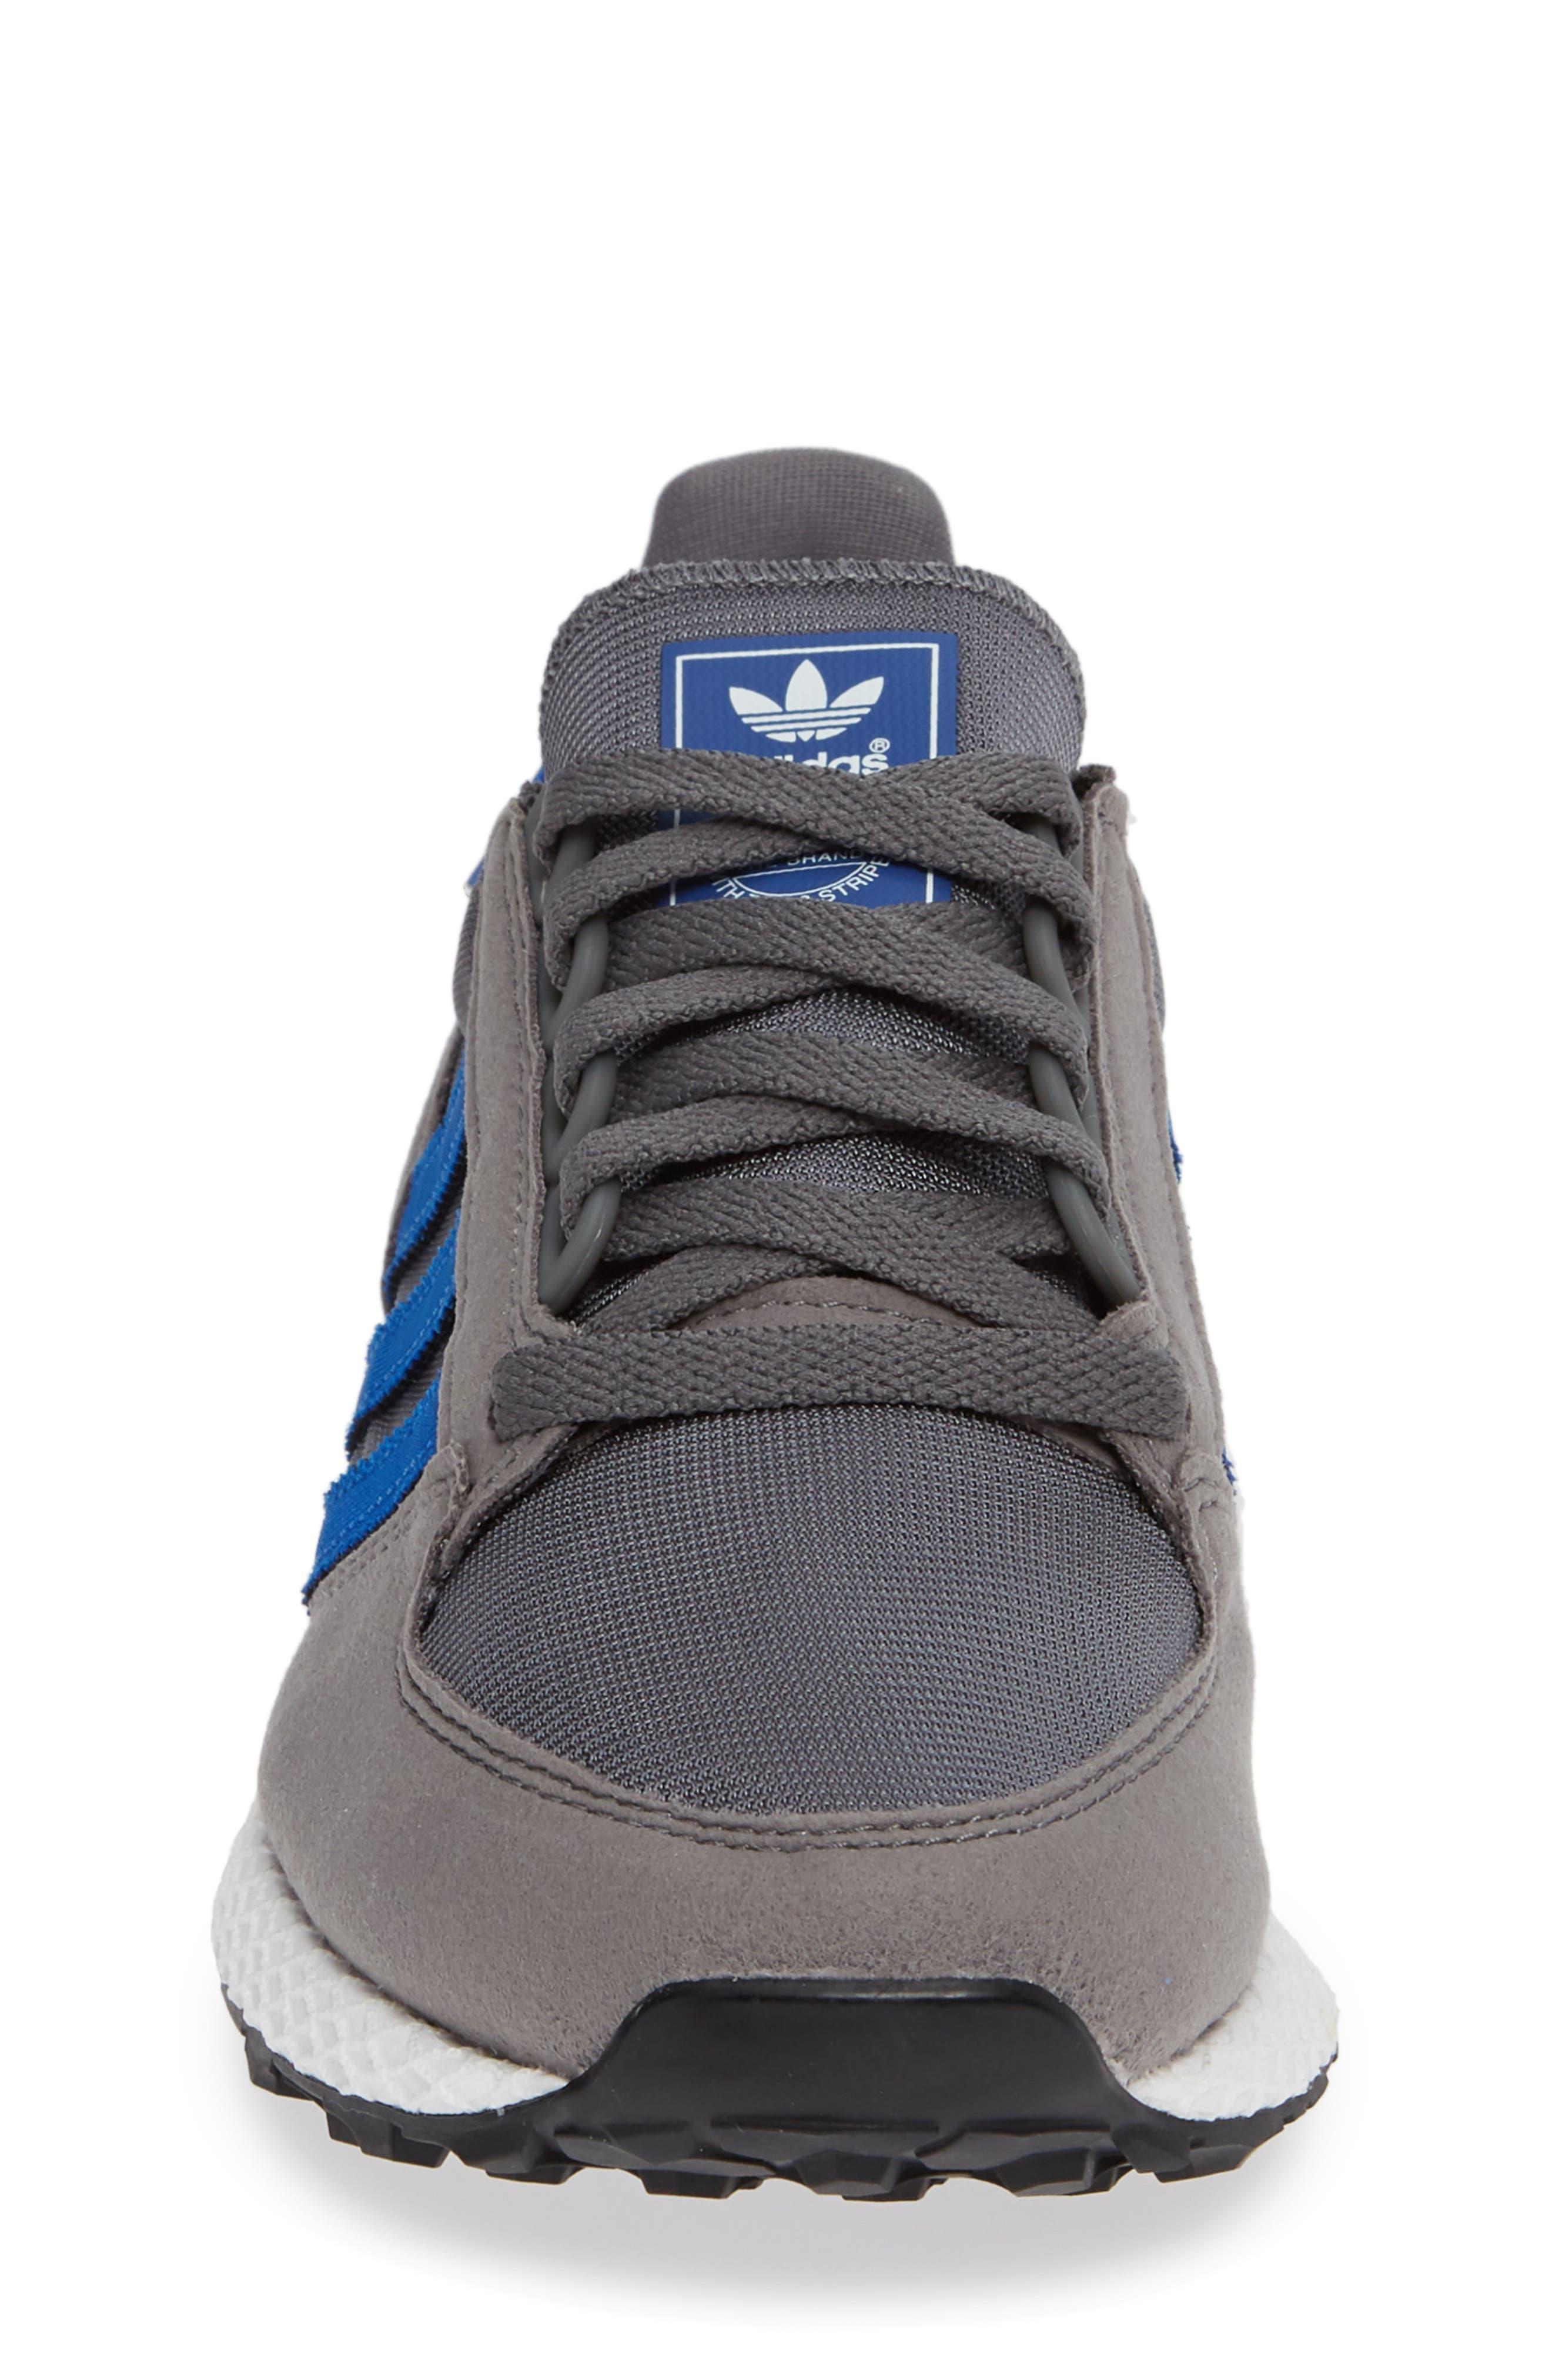 Forest Grove Sneaker,                             Alternate thumbnail 4, color,                             GREY/ COLLEGIATE ROYAL/ WHITE